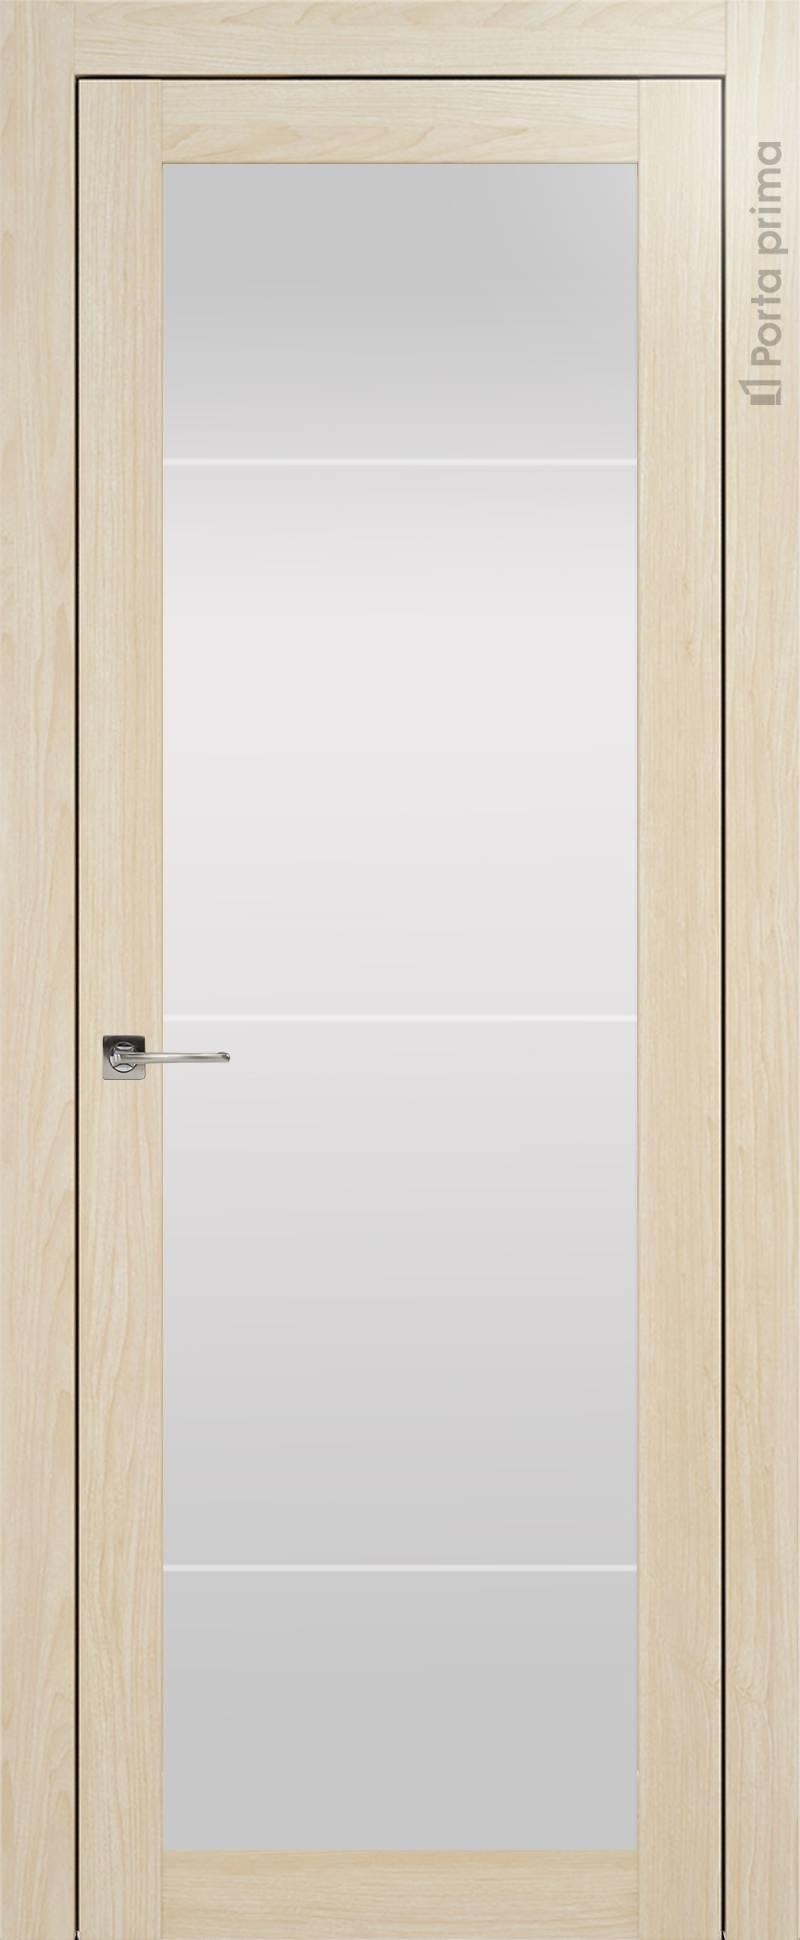 Tivoli З-3 цвет - Клен Со стеклом (ДО)